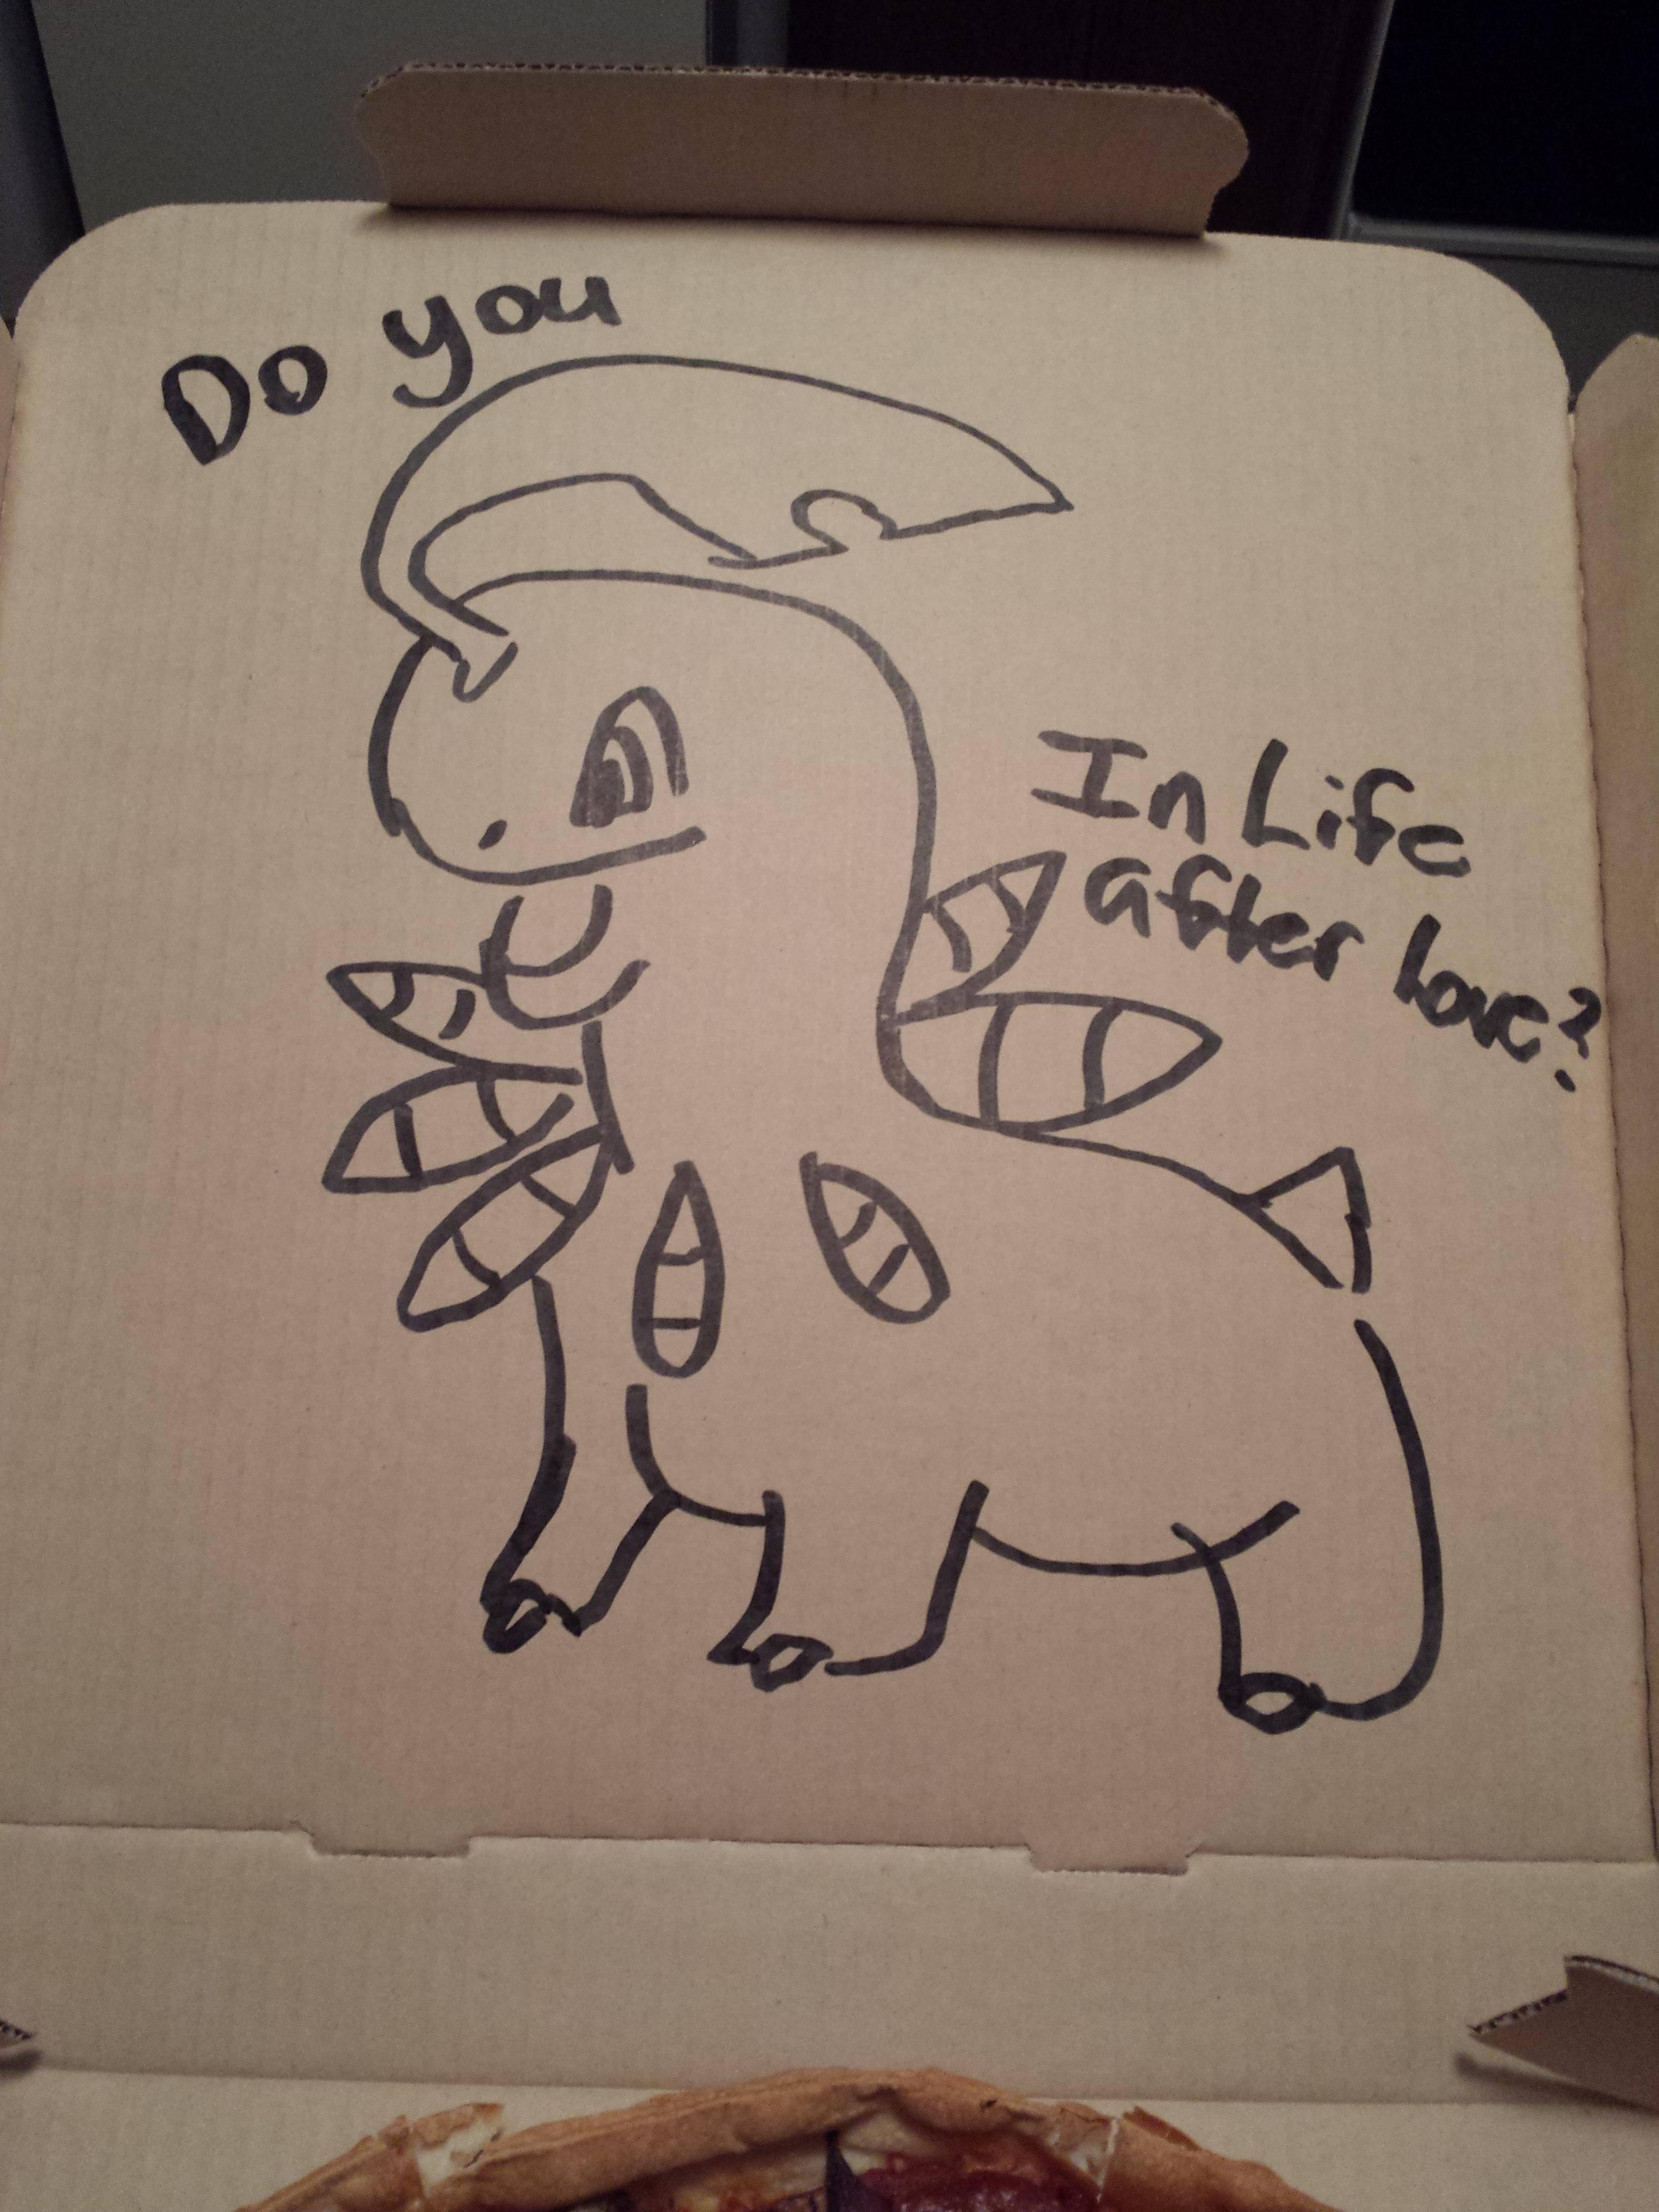 3096x4128 I Asked Pizza Hut To Draw A Pokemon On My Box I Want